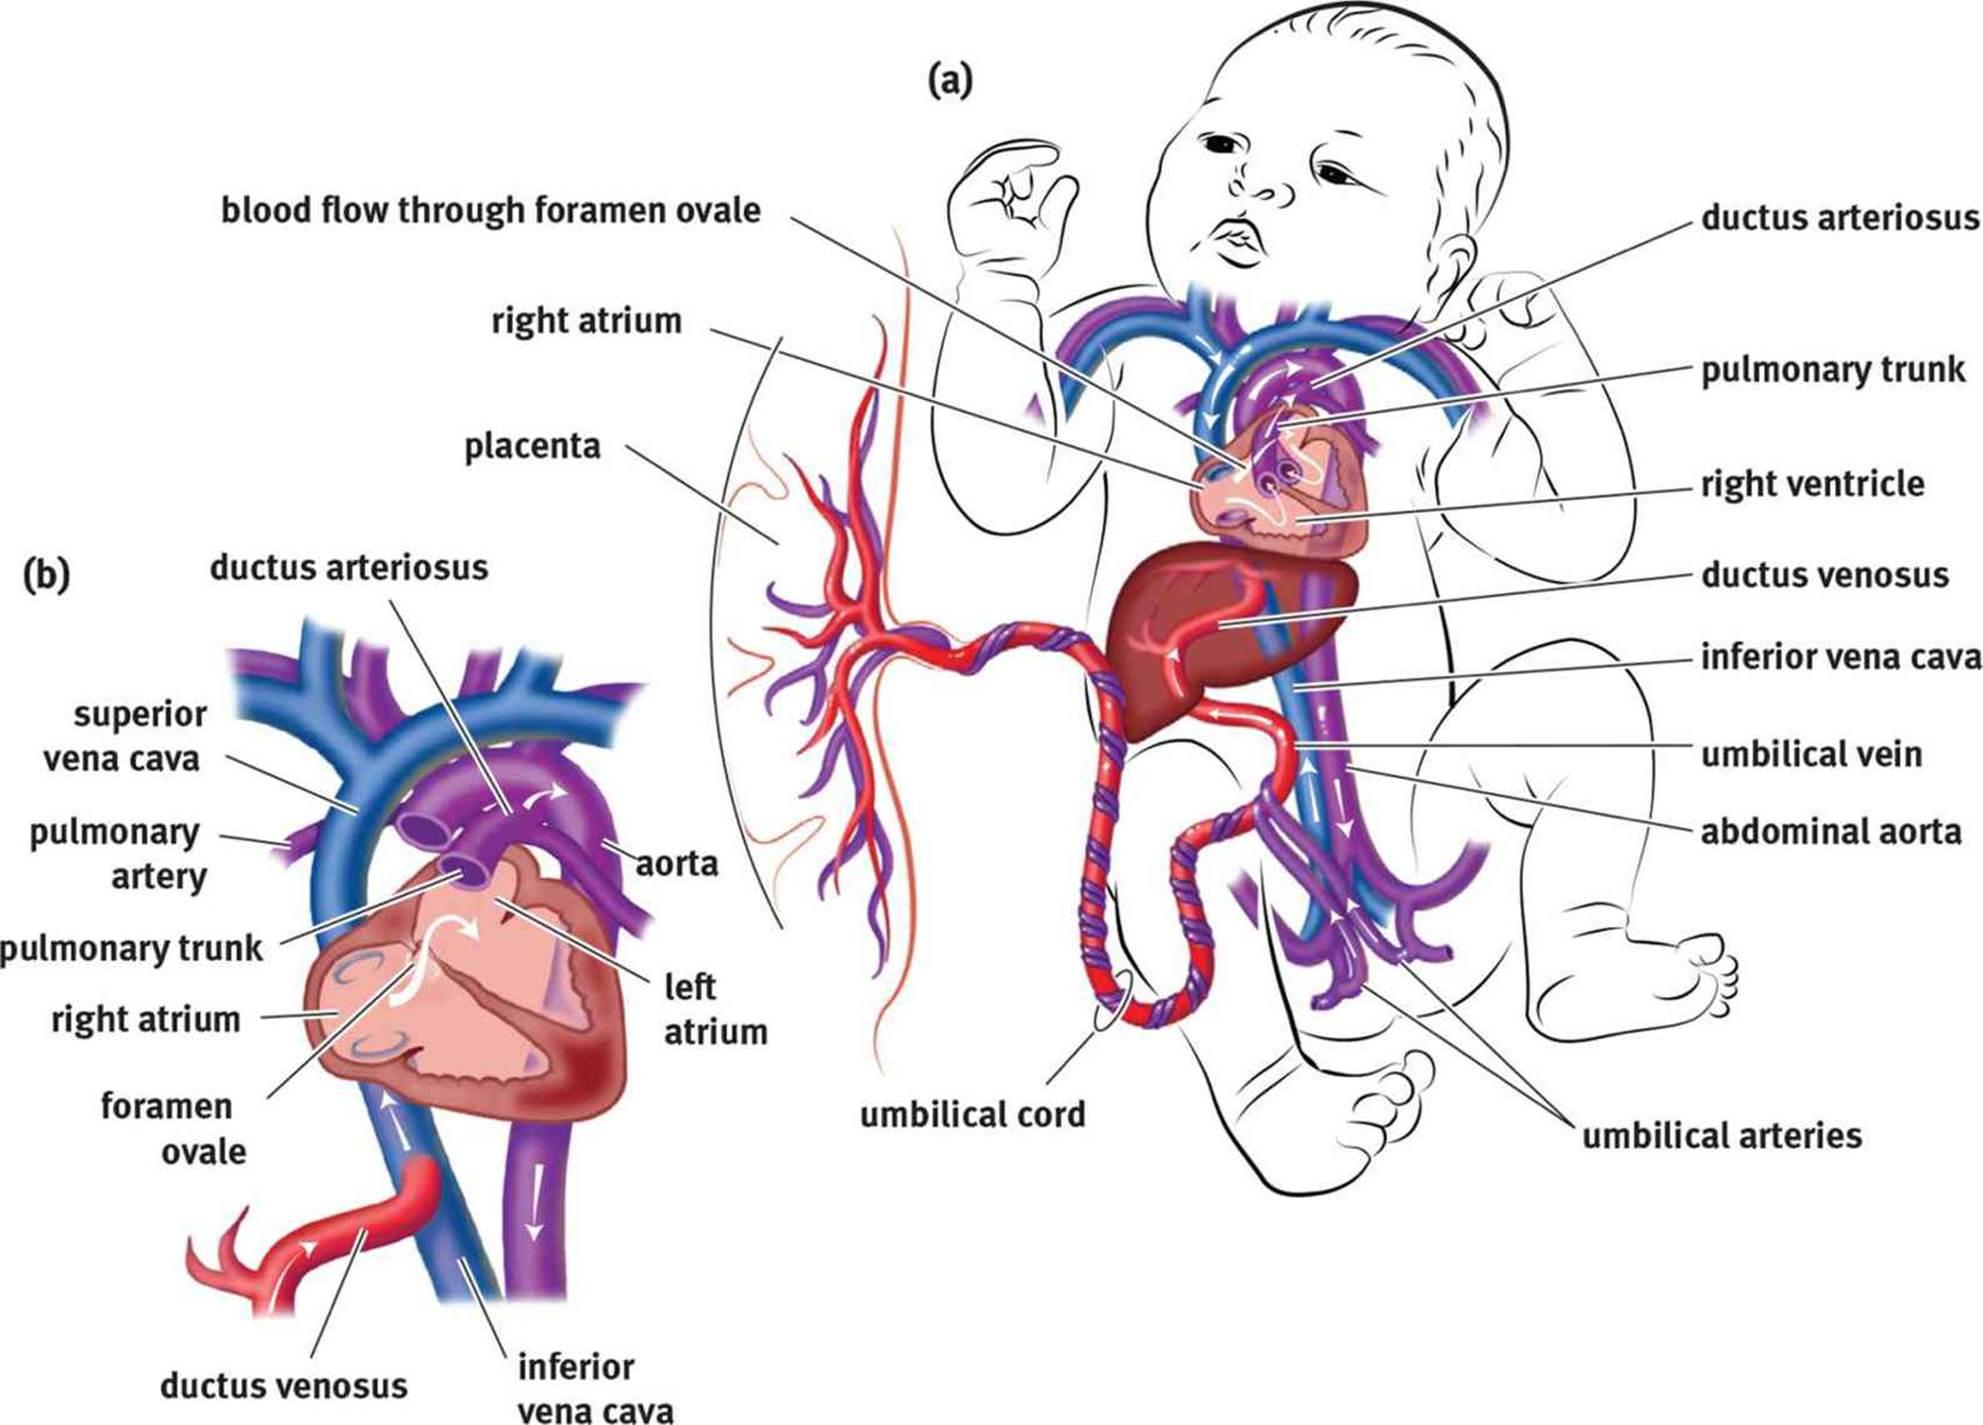 fetal circulation embryogenesis and development mcat. Black Bedroom Furniture Sets. Home Design Ideas